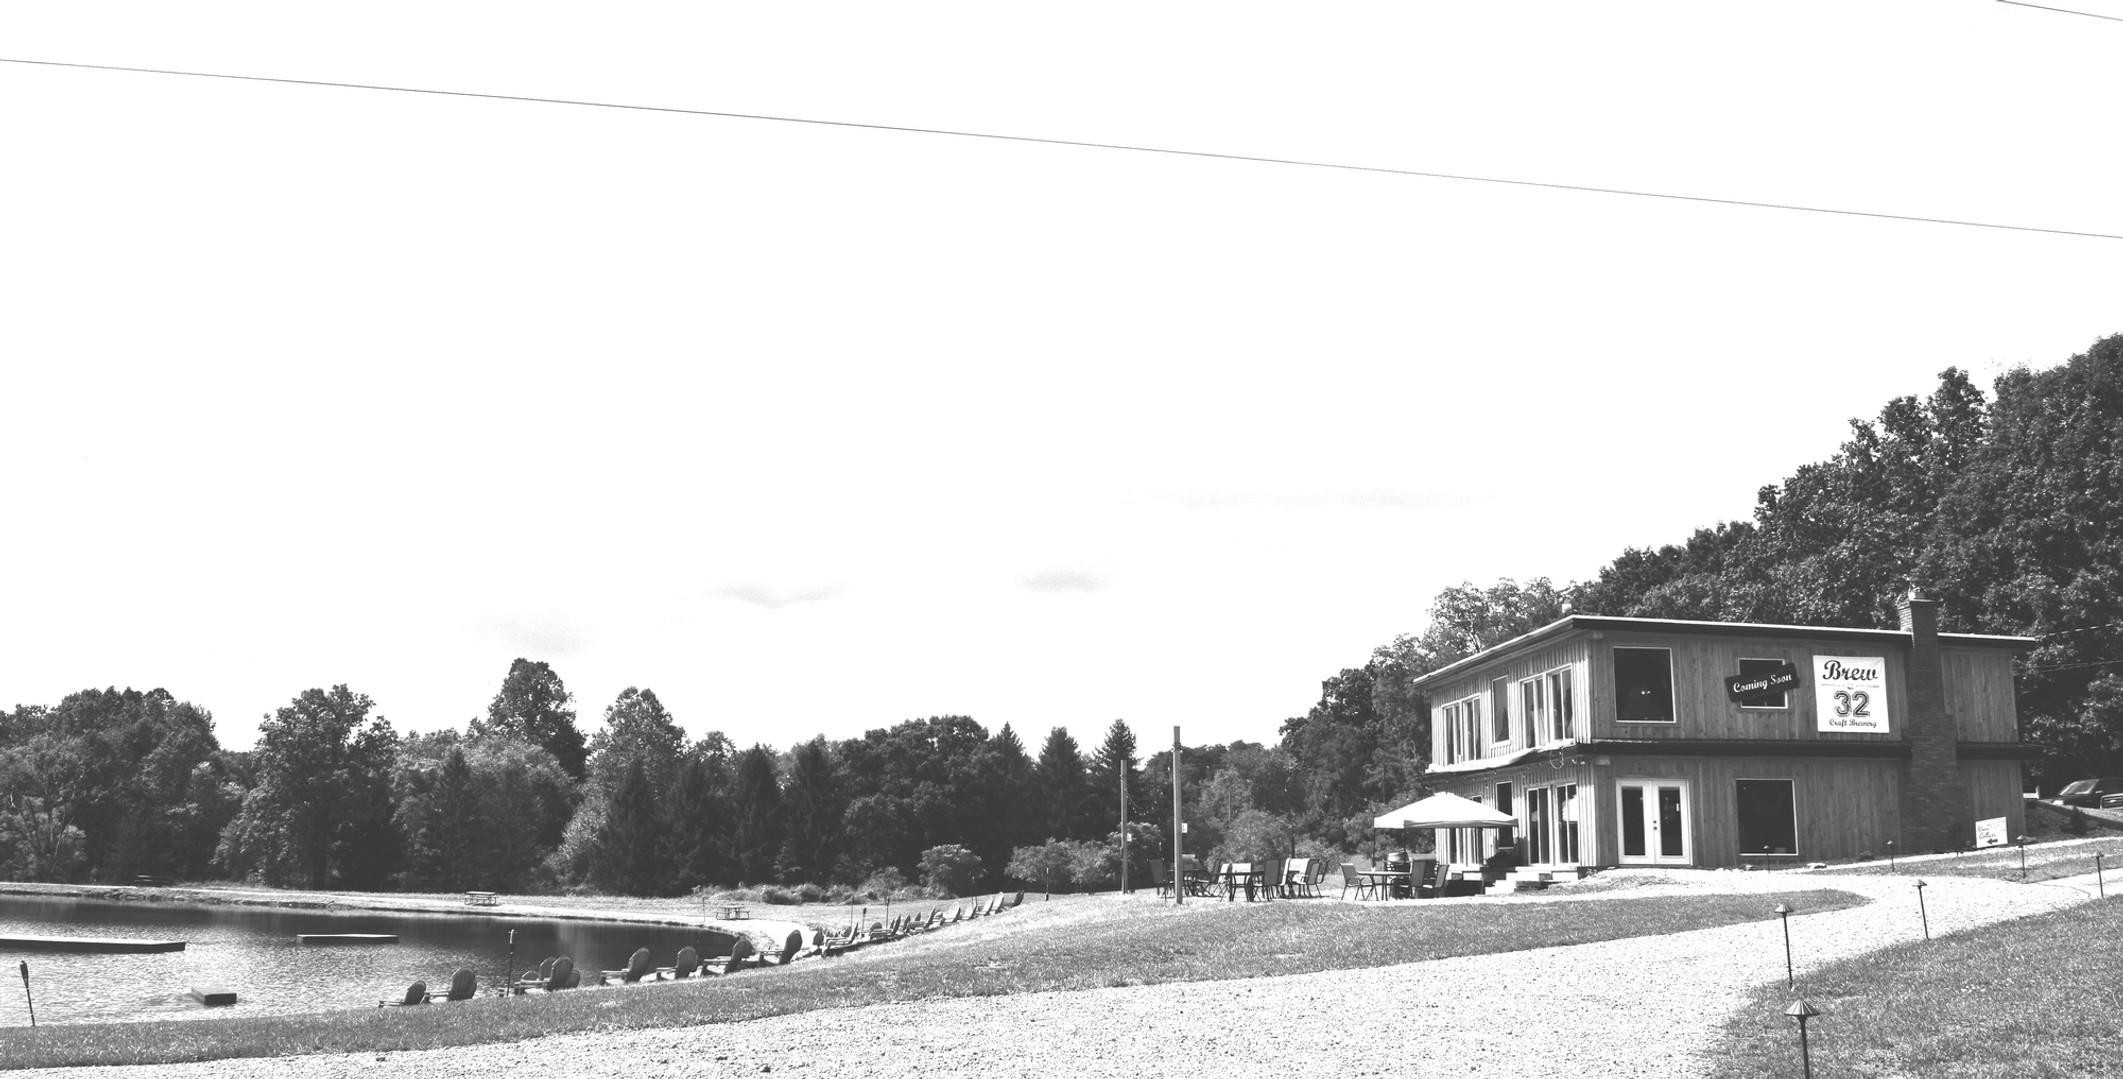 bw building and lake.jpg